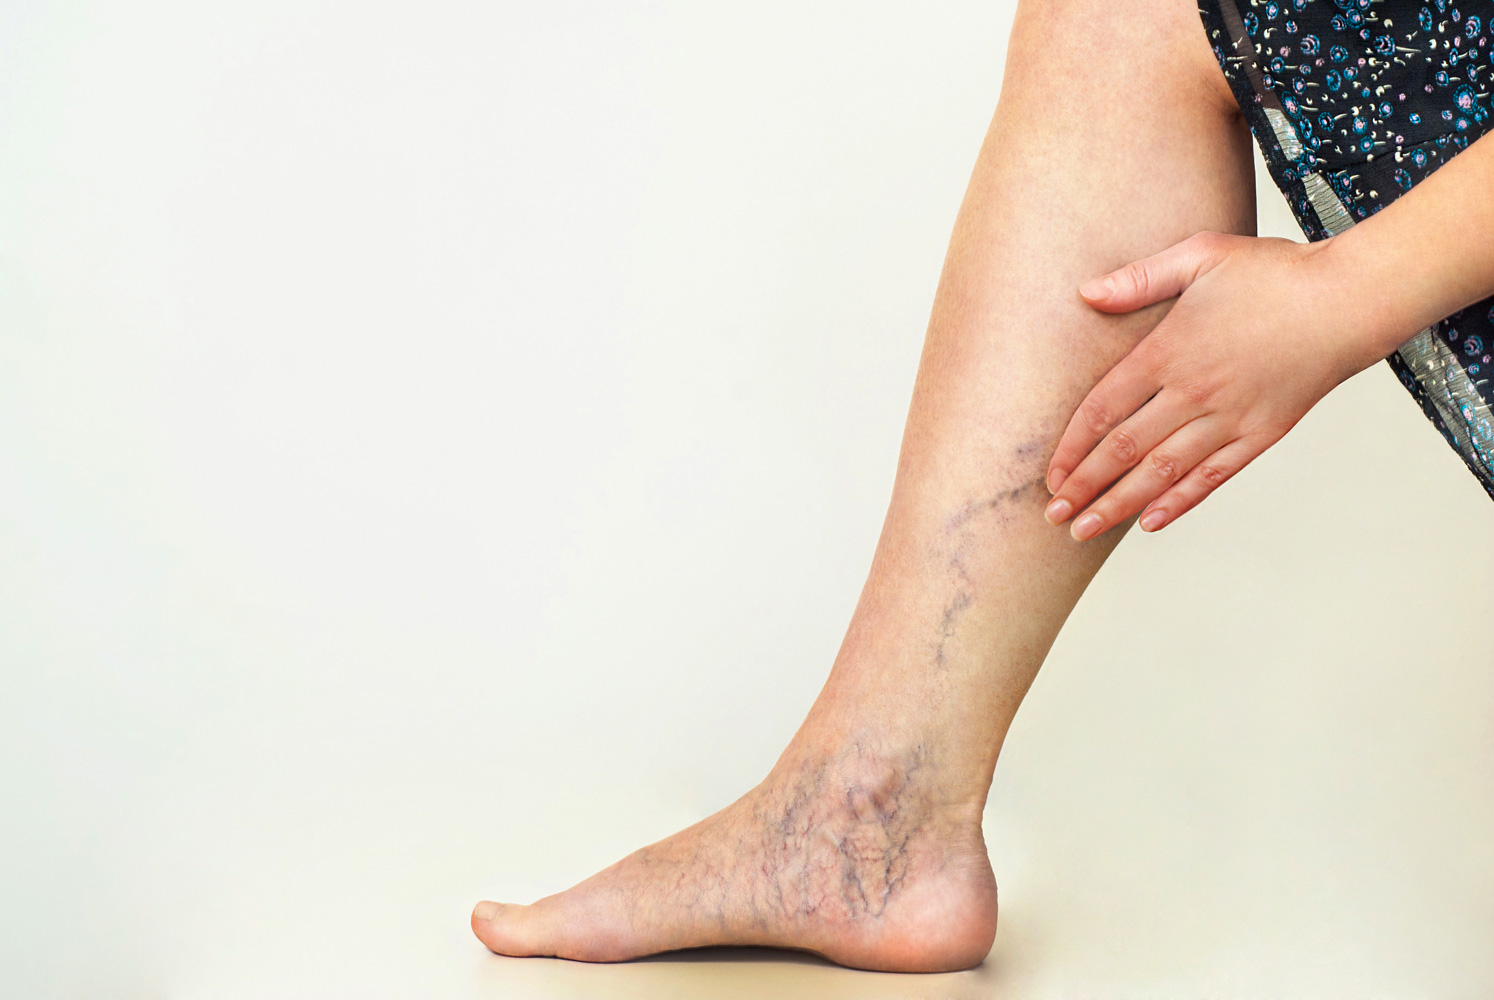 Tratamento de lesões vasculares a laser